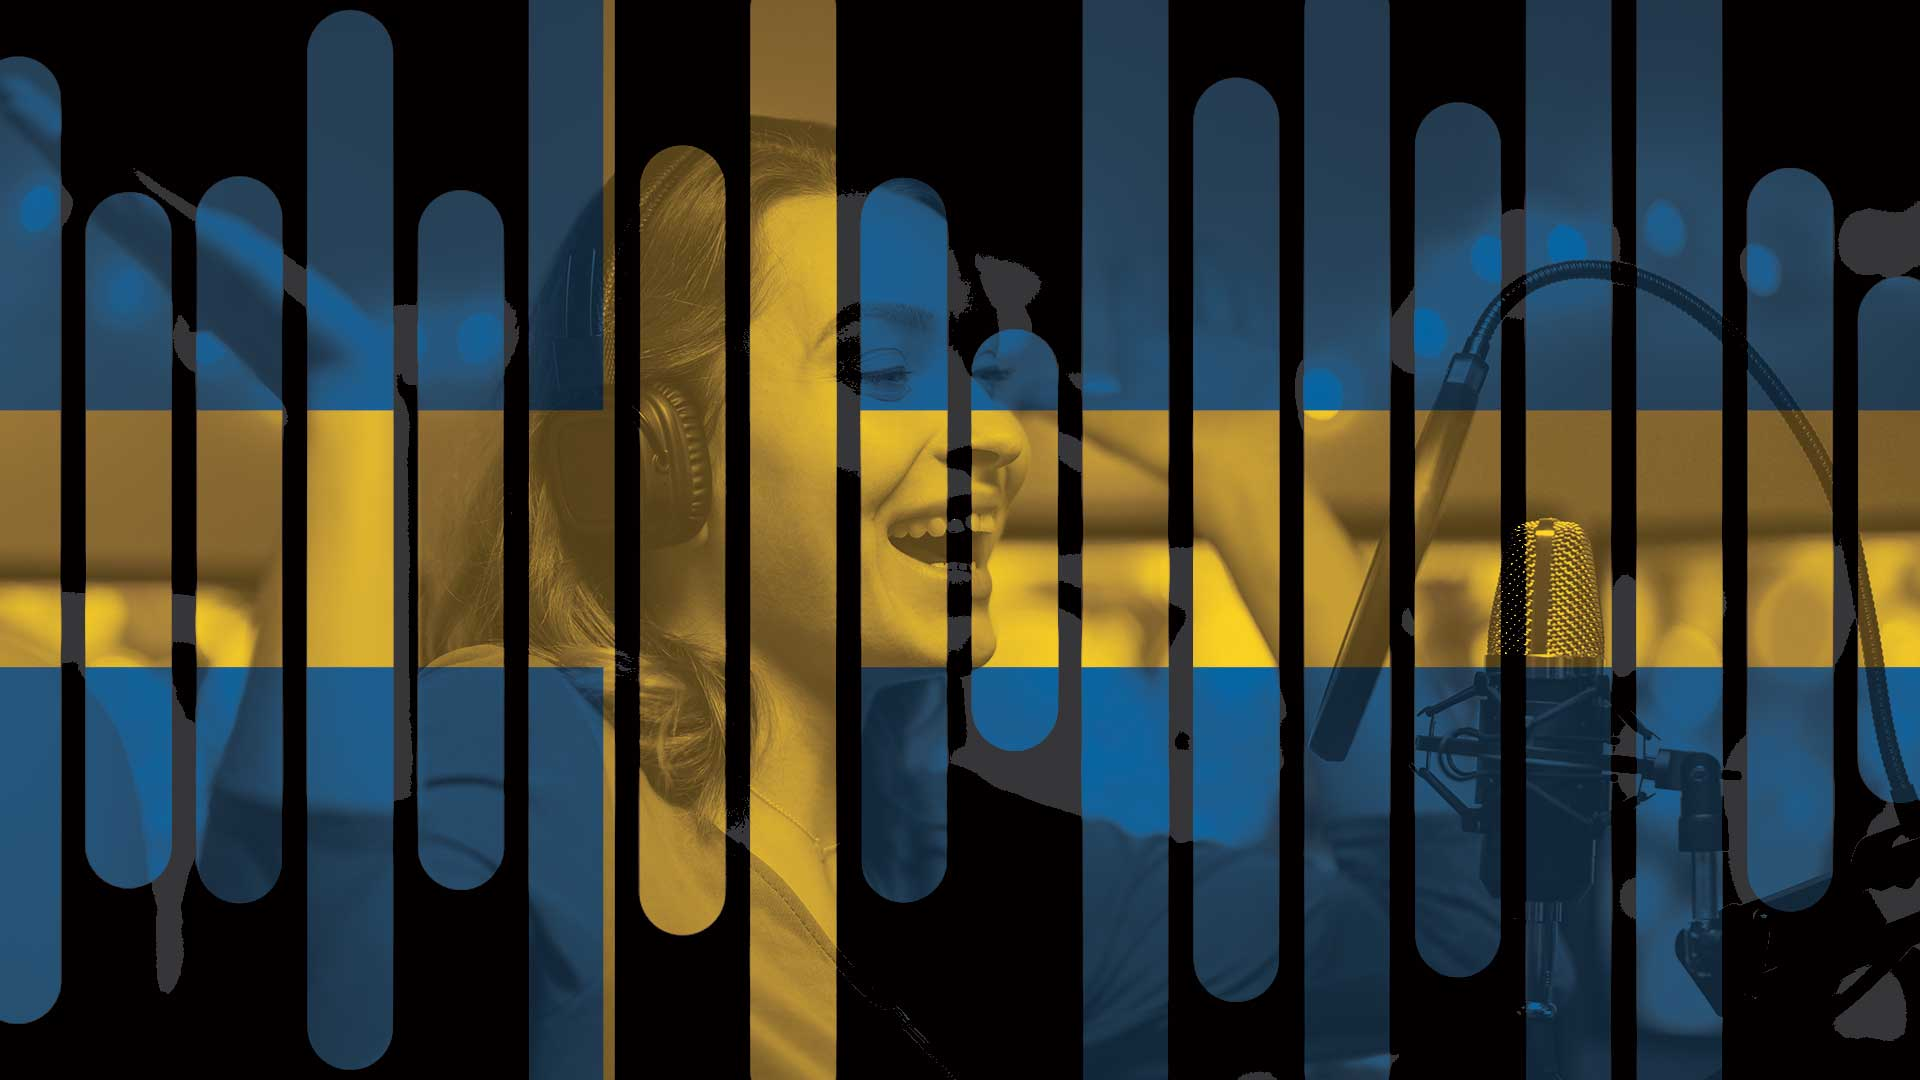 Voice-Over Services Sweden - Voquent